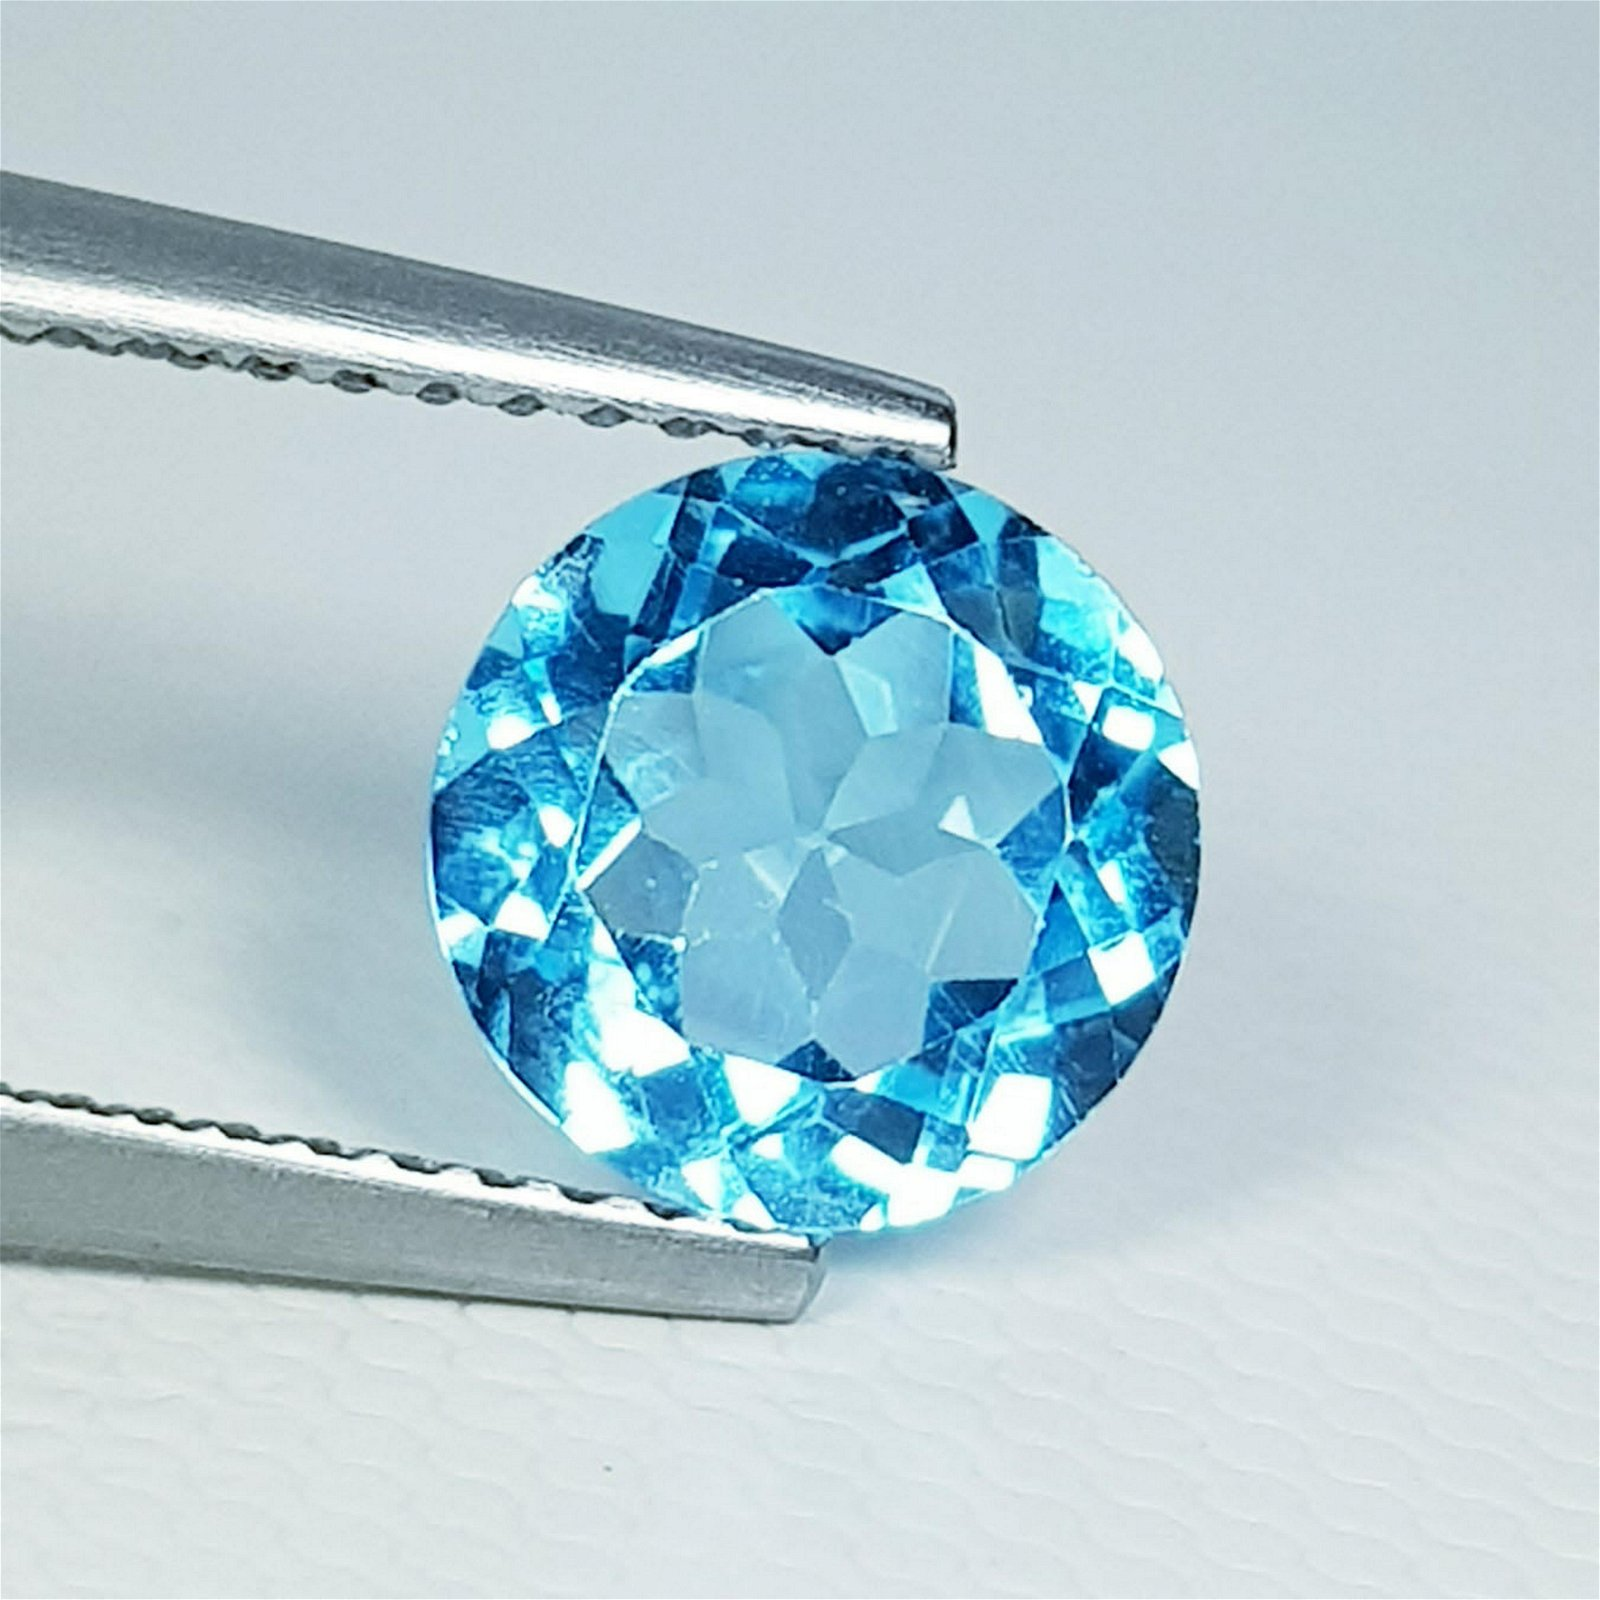 Natural Blue Topaz Round Cut 2.15 ct